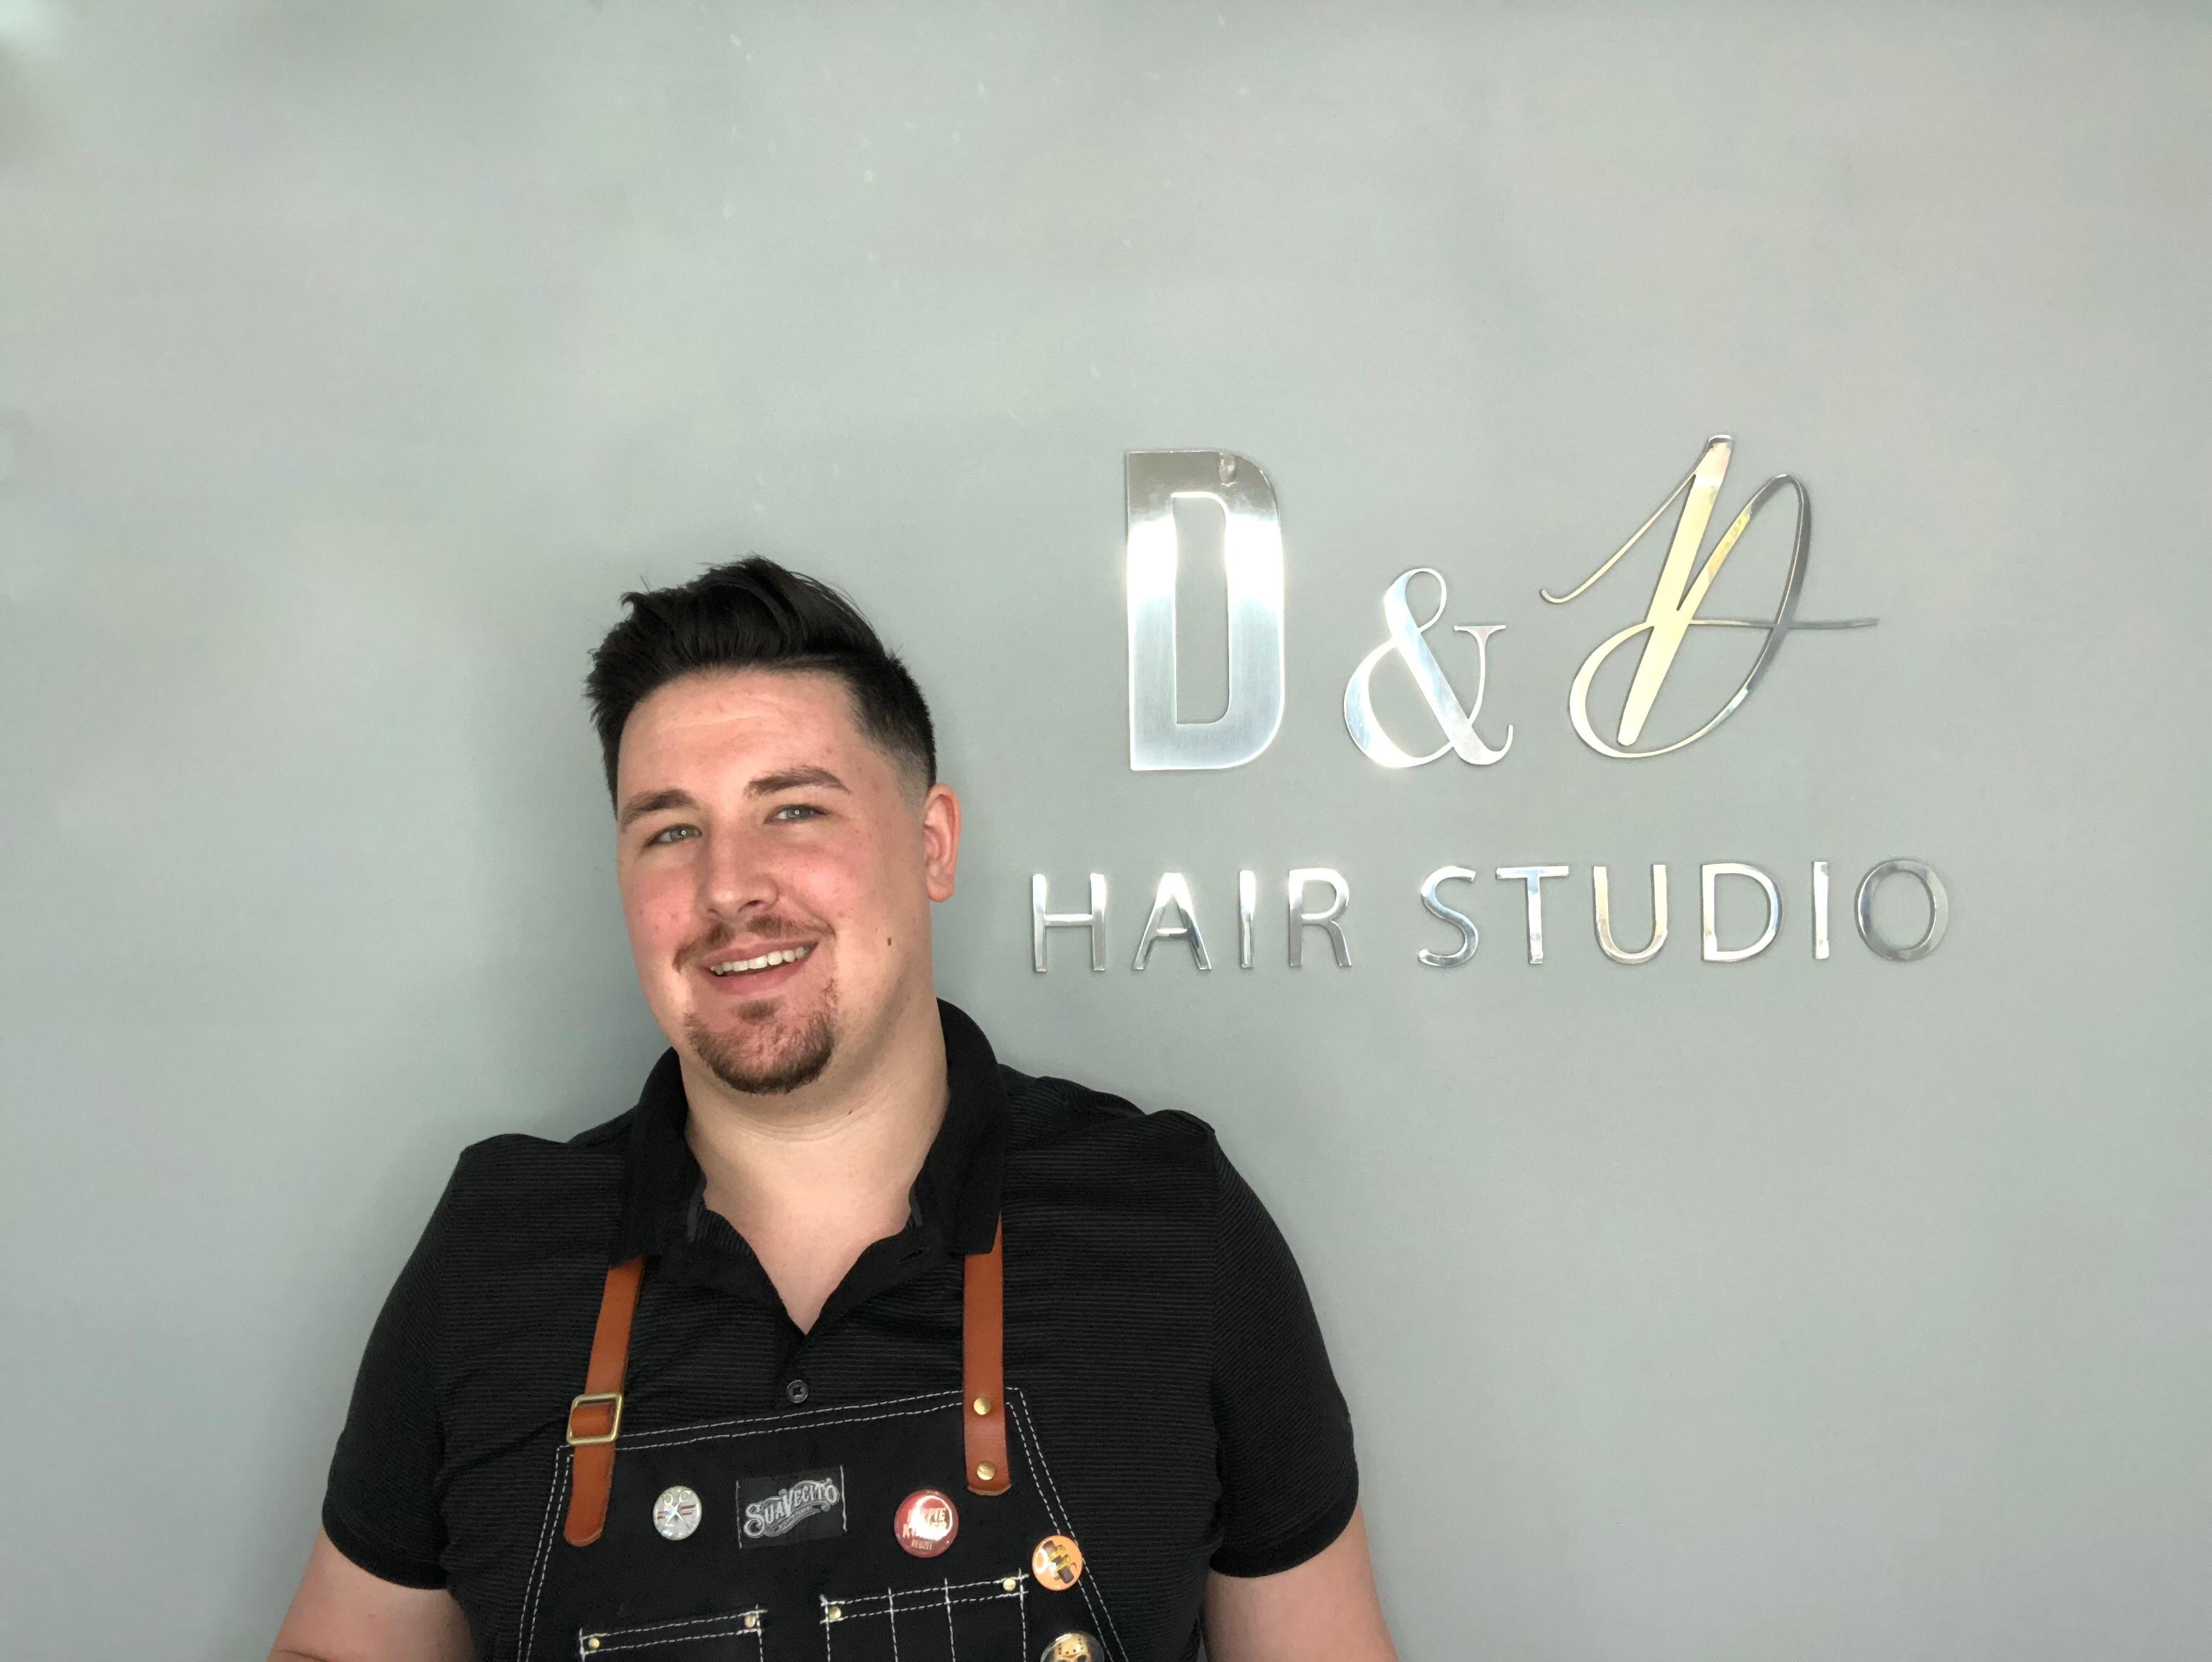 brad hair stylist